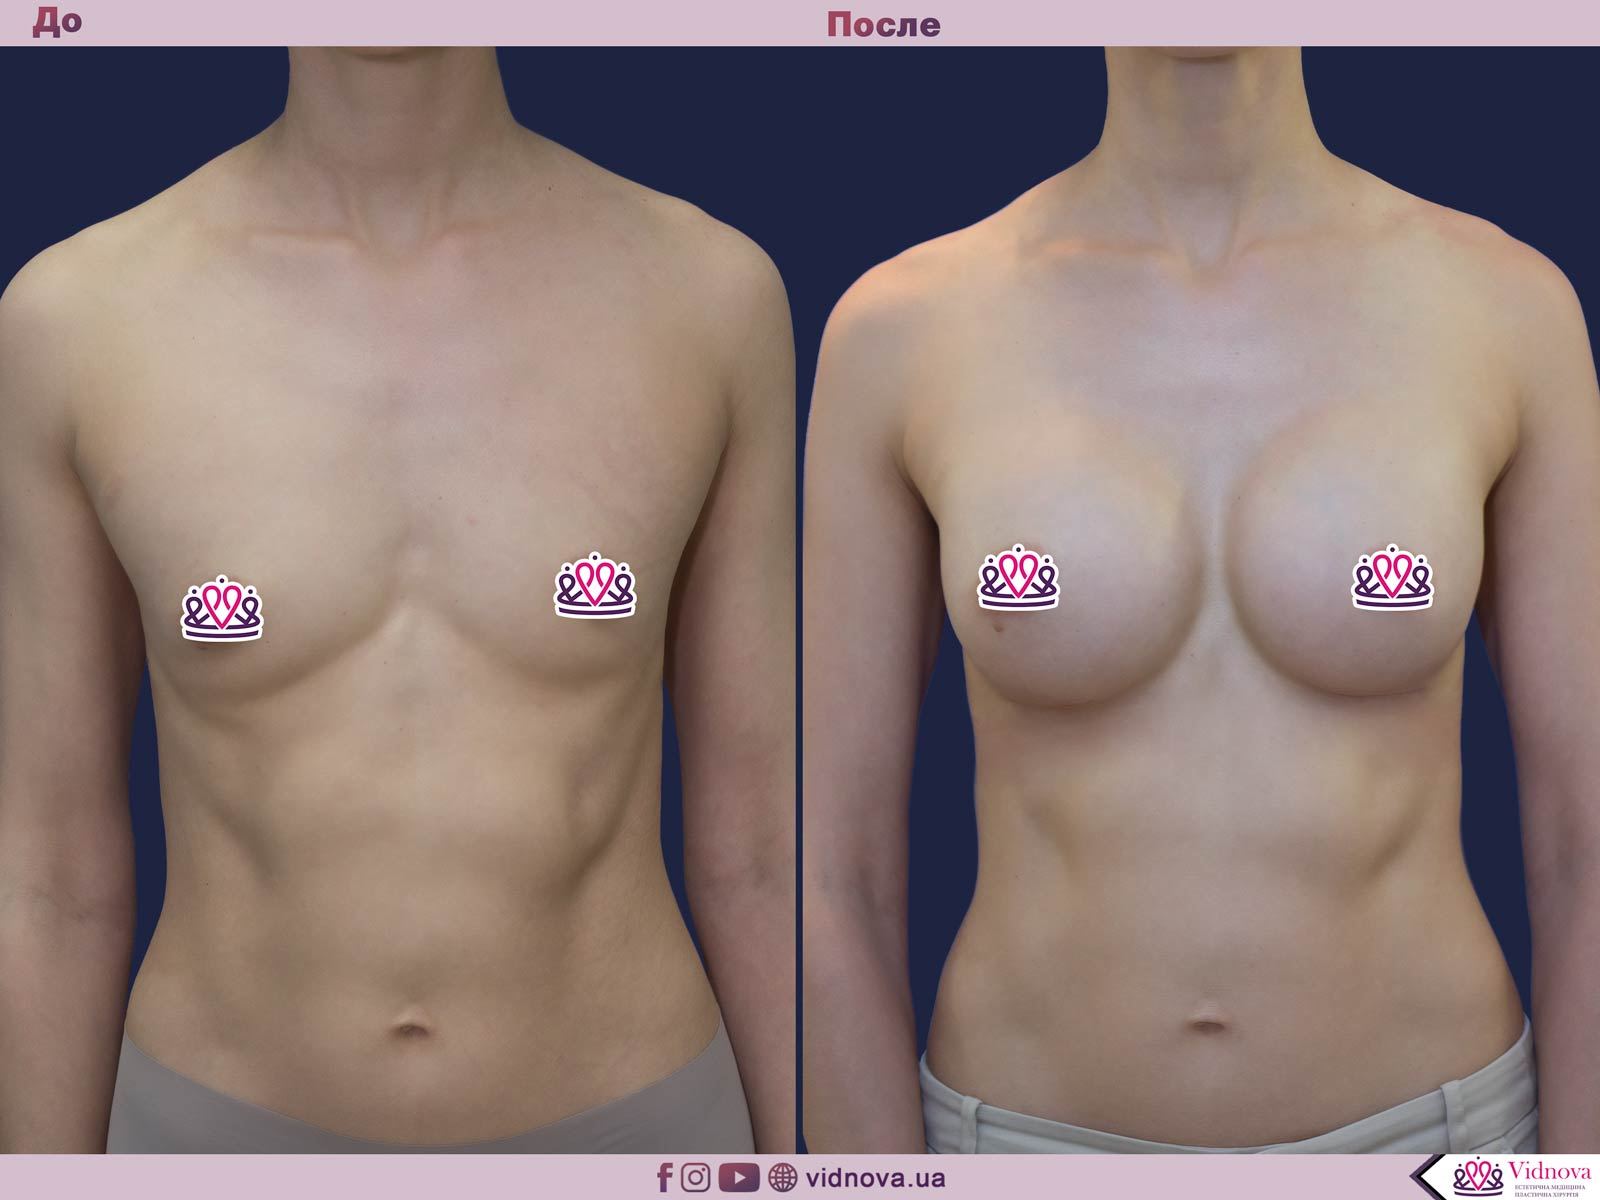 Увеличение груди: Фото ДО и ПОСЛЕ - Пример №52-1 - Клиника Vidnova